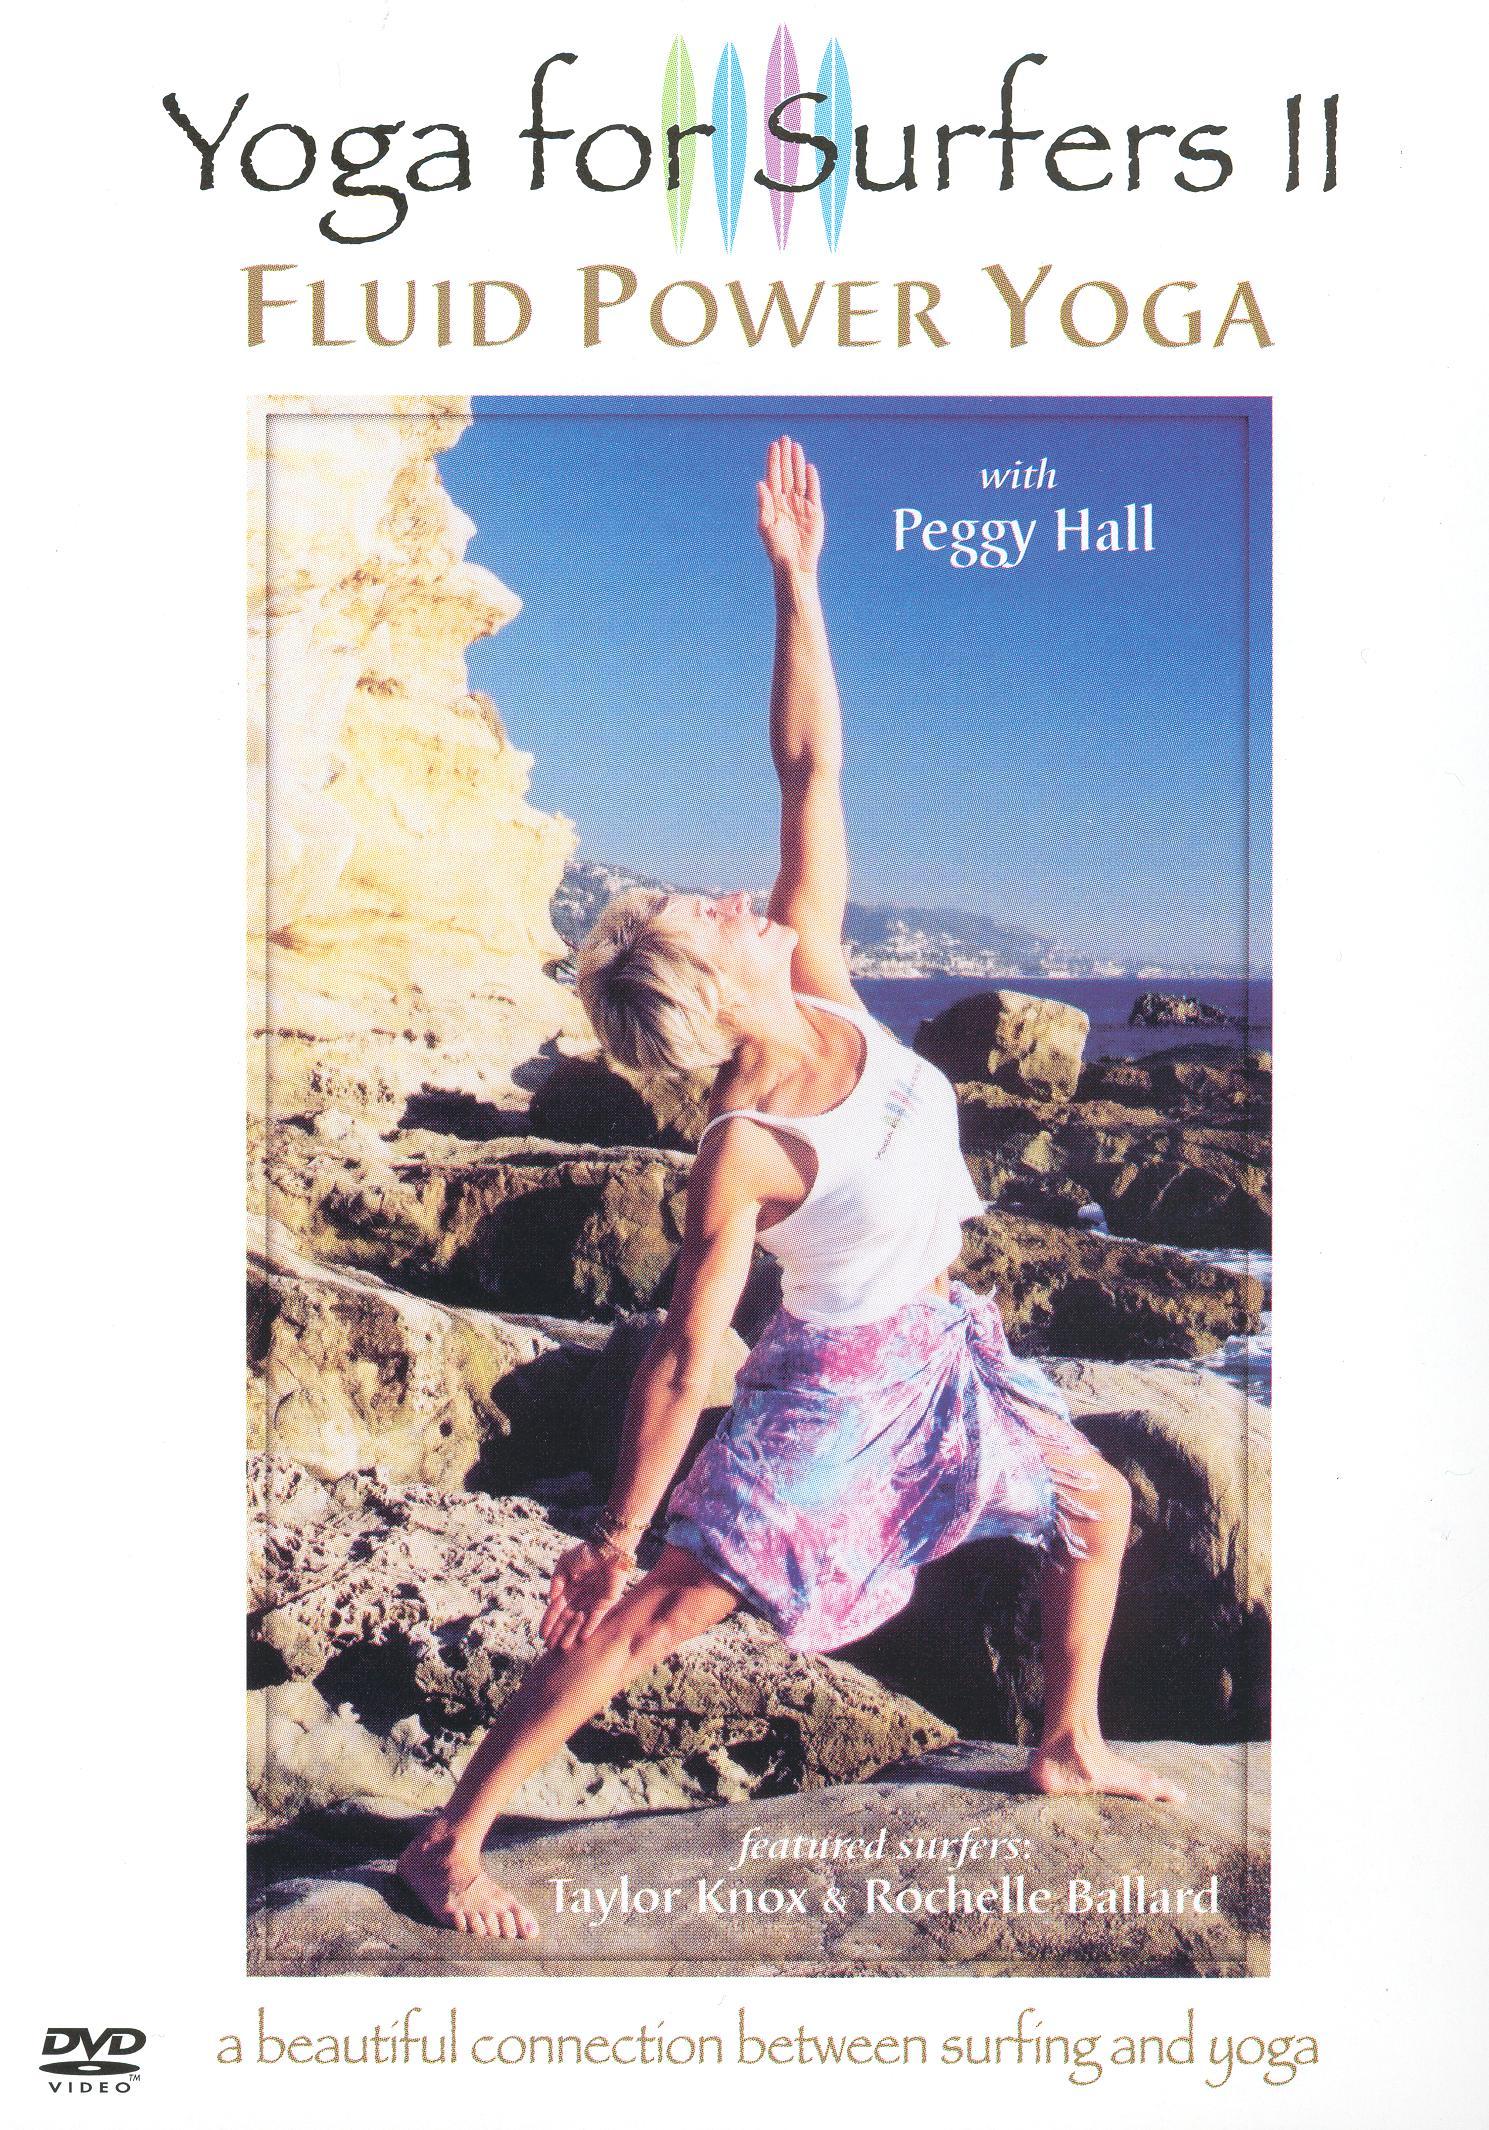 Yoga for Surfers II: Fluid Power Yoga